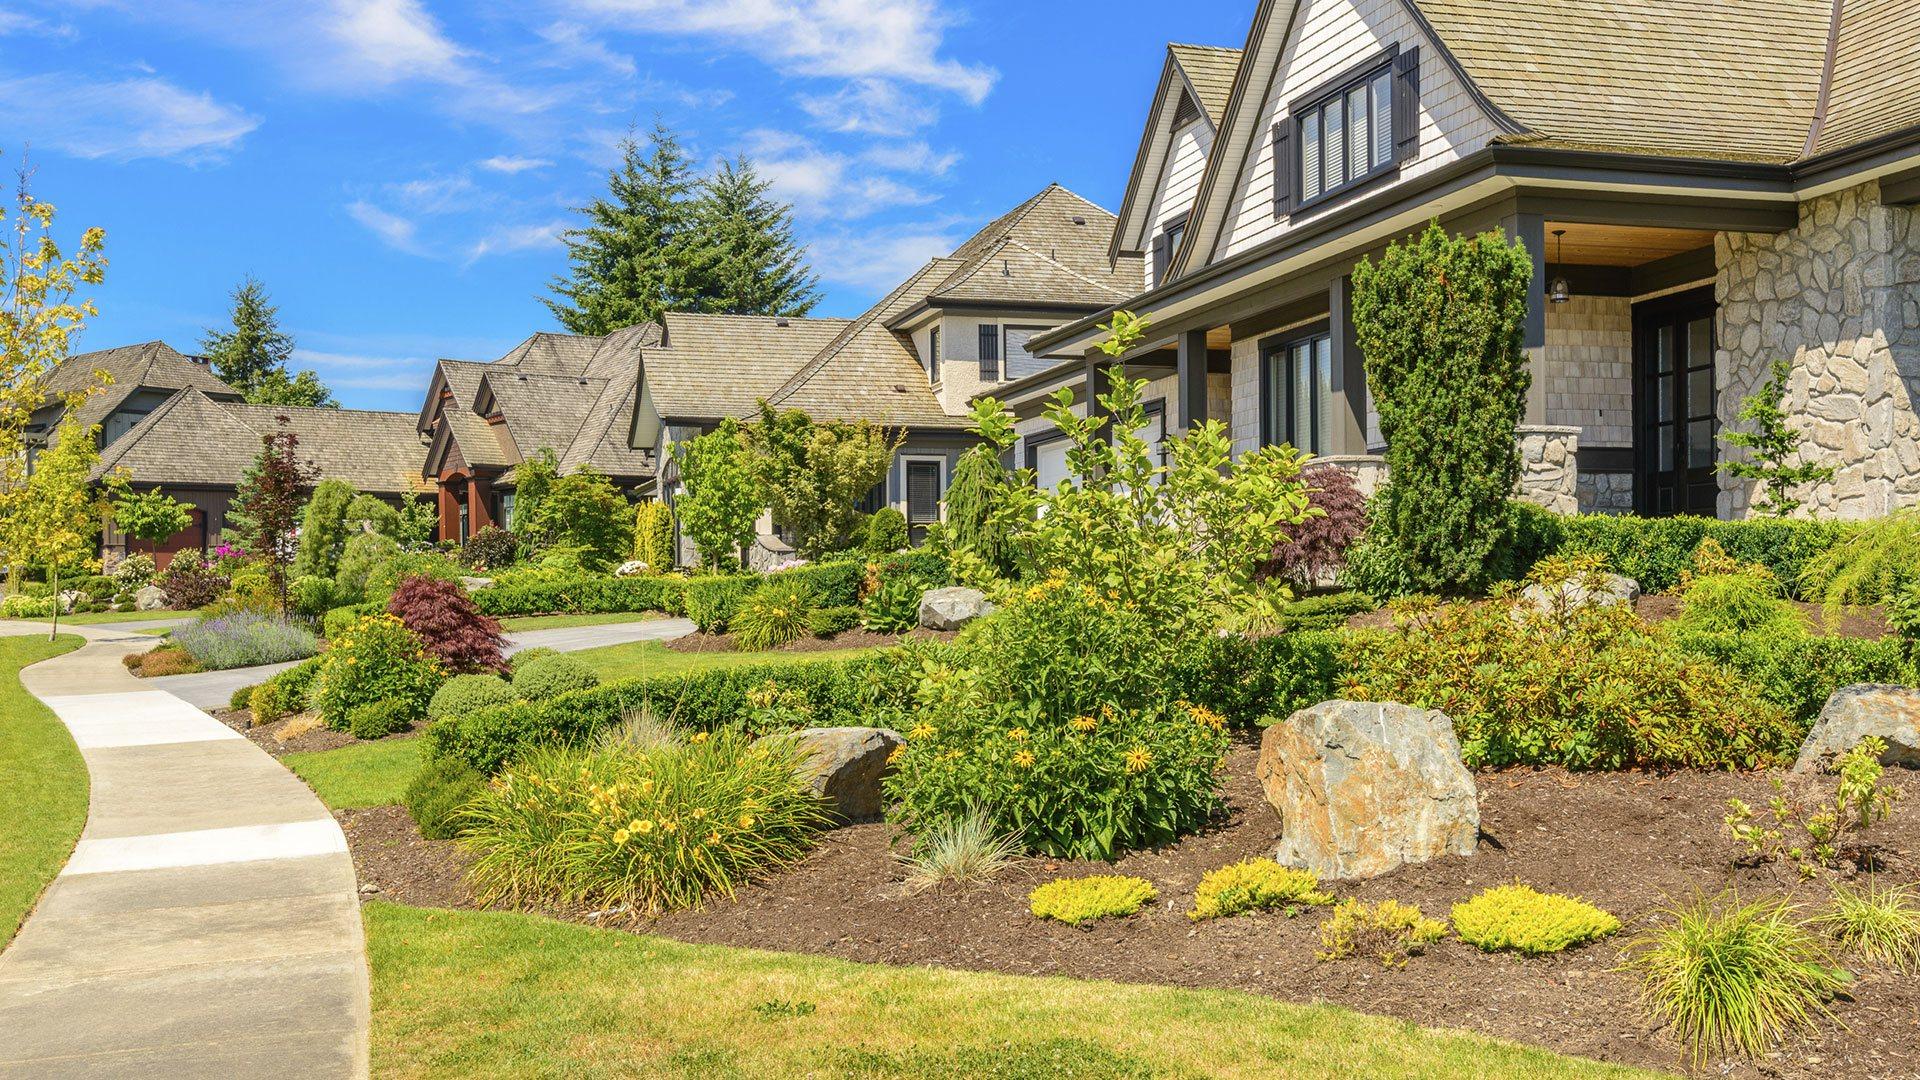 Green Leaf Property Management Services Commercial Garden Design, Commercial Landscaping and Commercial Property Maintenance slide 2